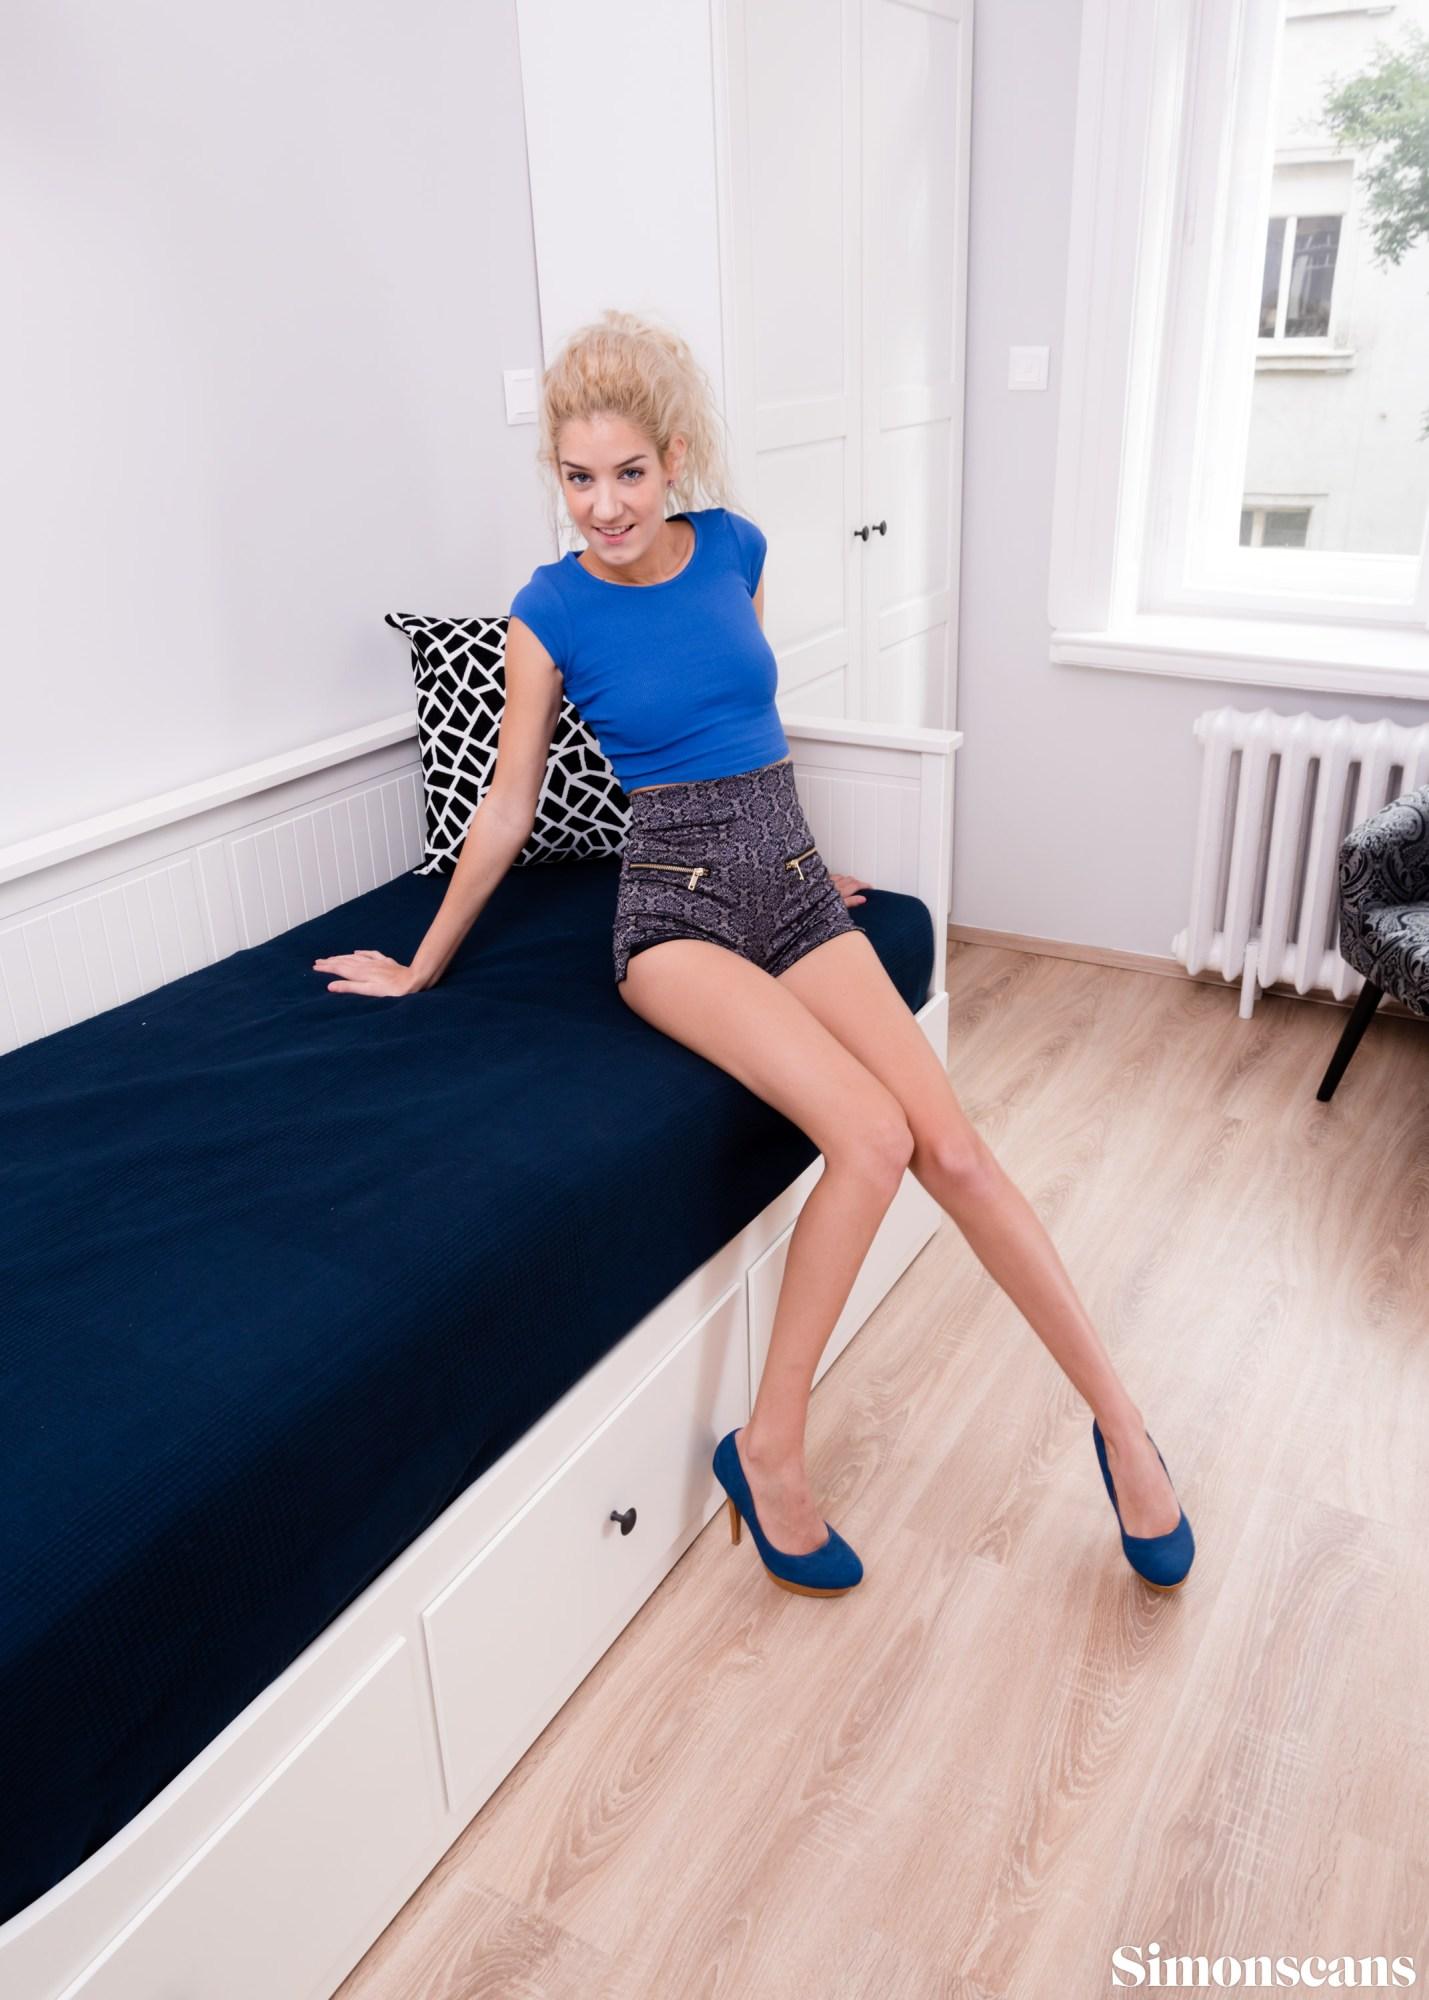 Monique has incredible long legs